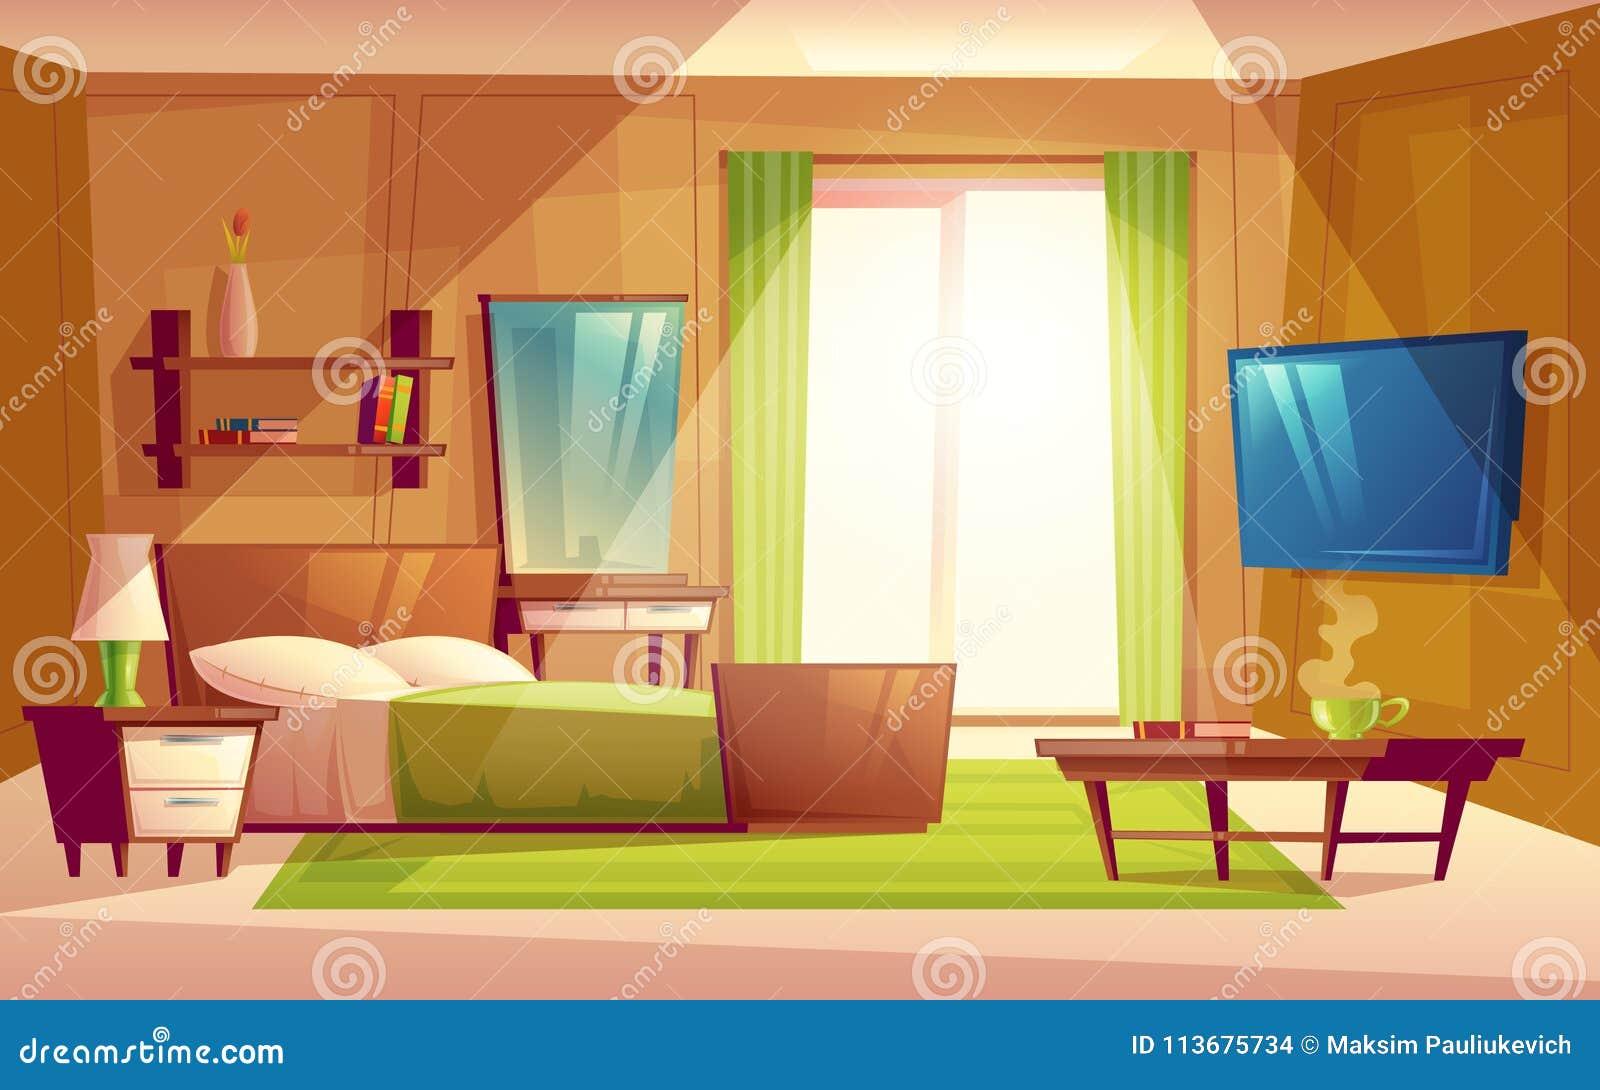 Cartoon Living Room Stock Illustrations 17 291 Cartoon Living Room Stock Illustrations Vectors Clipart Dreamstime